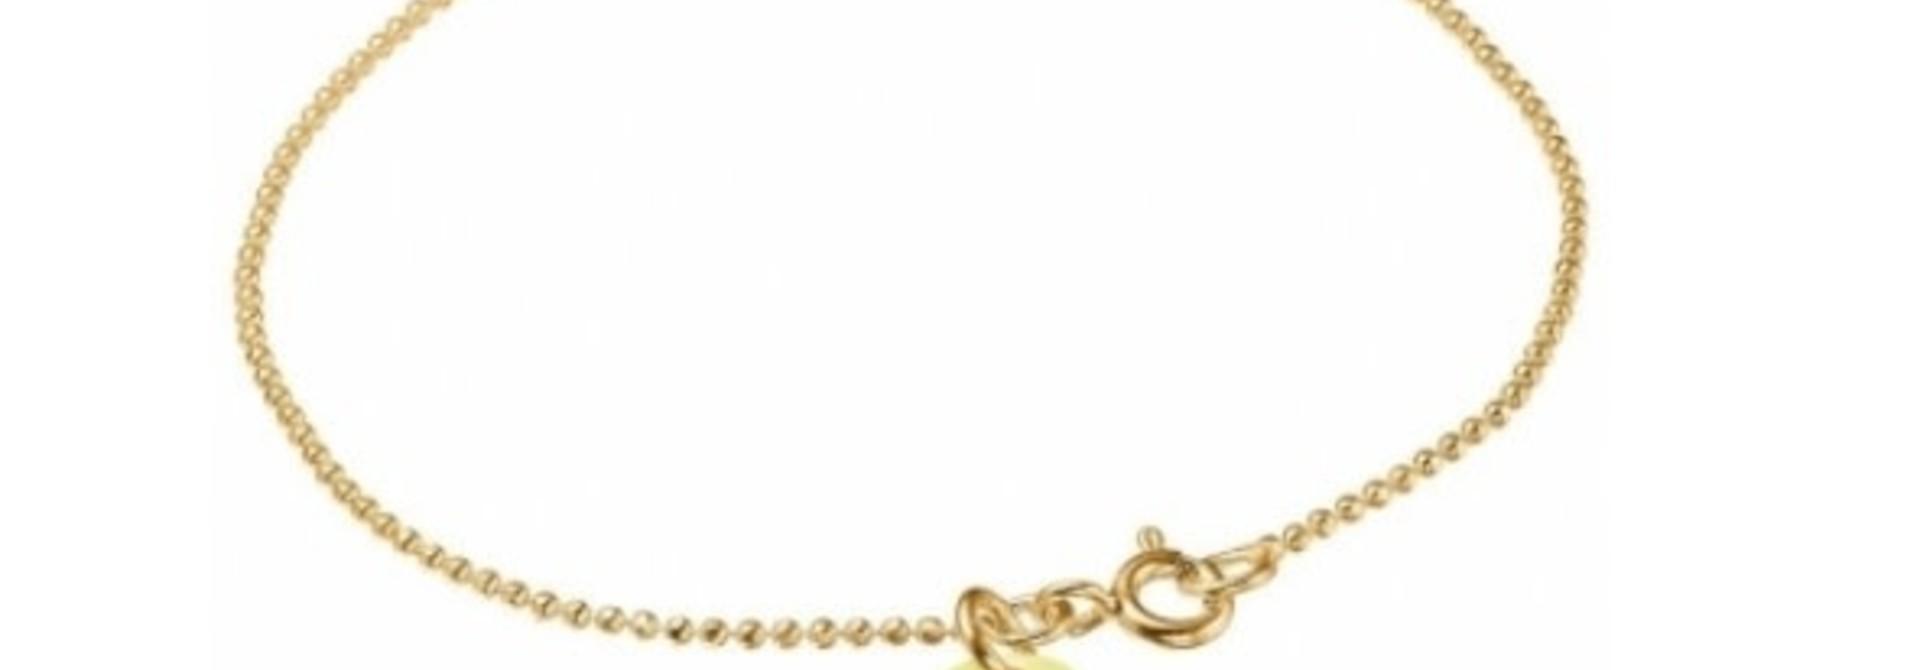 Bracelet ball chain light yellow